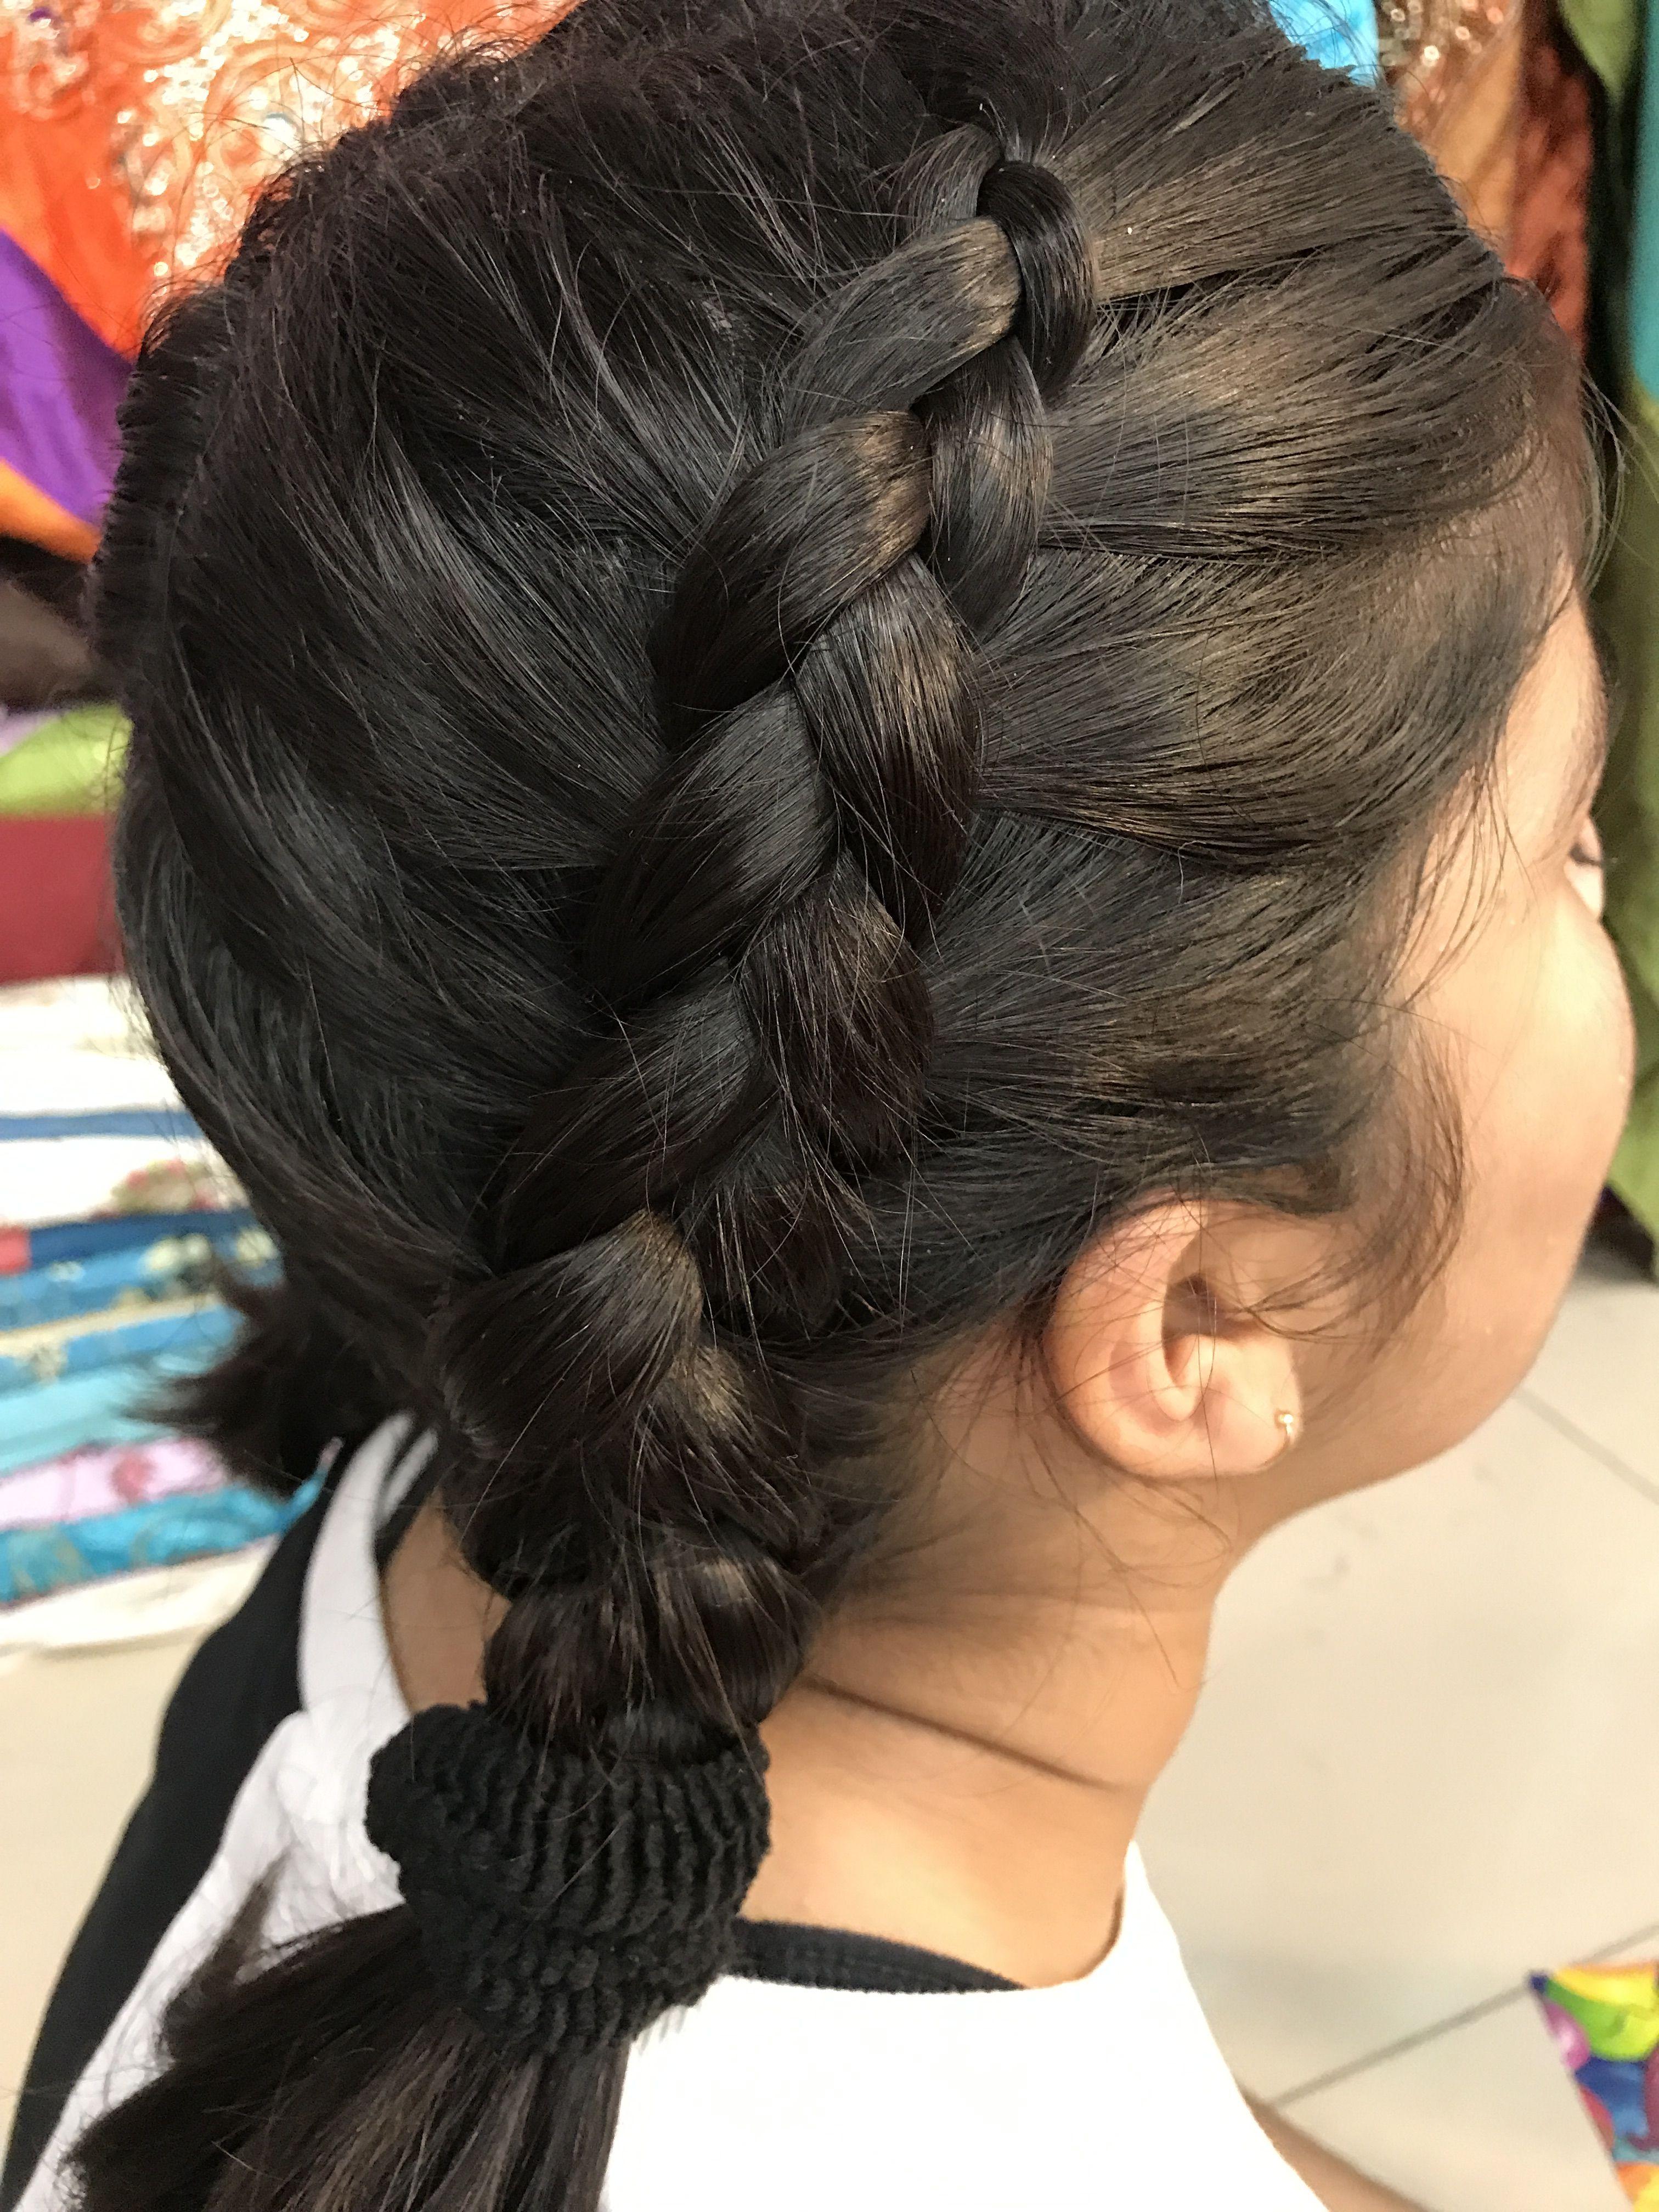 Pin by saishaa mehta on hair goals pinterest hair goals